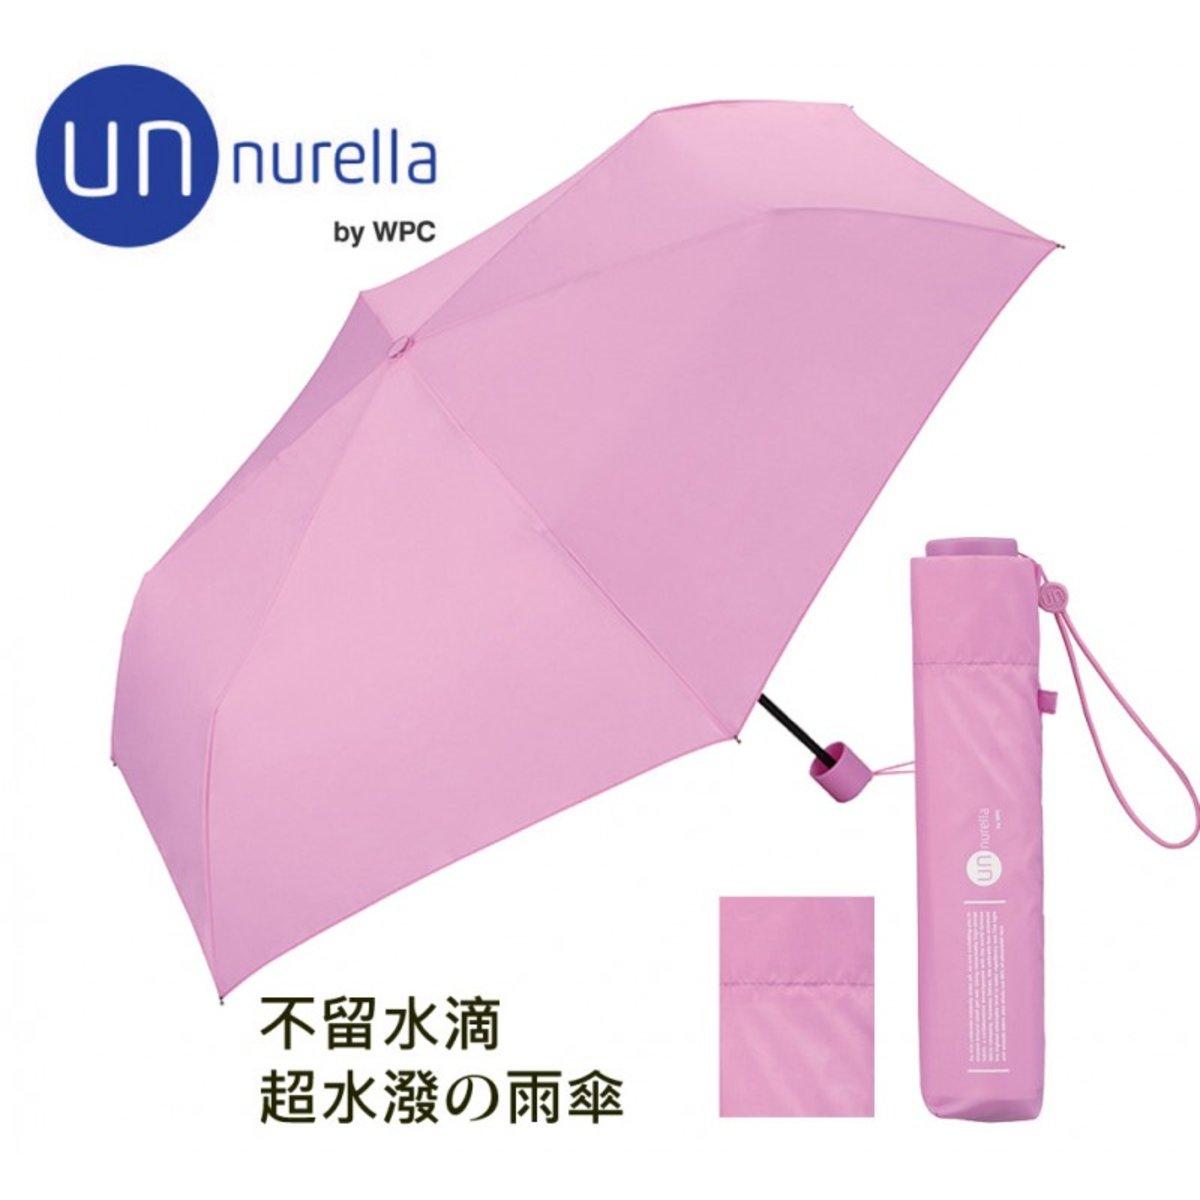 Japan Unnurella Folding umbrella Super splashing Anit 99% UV Un-106-PK PINK